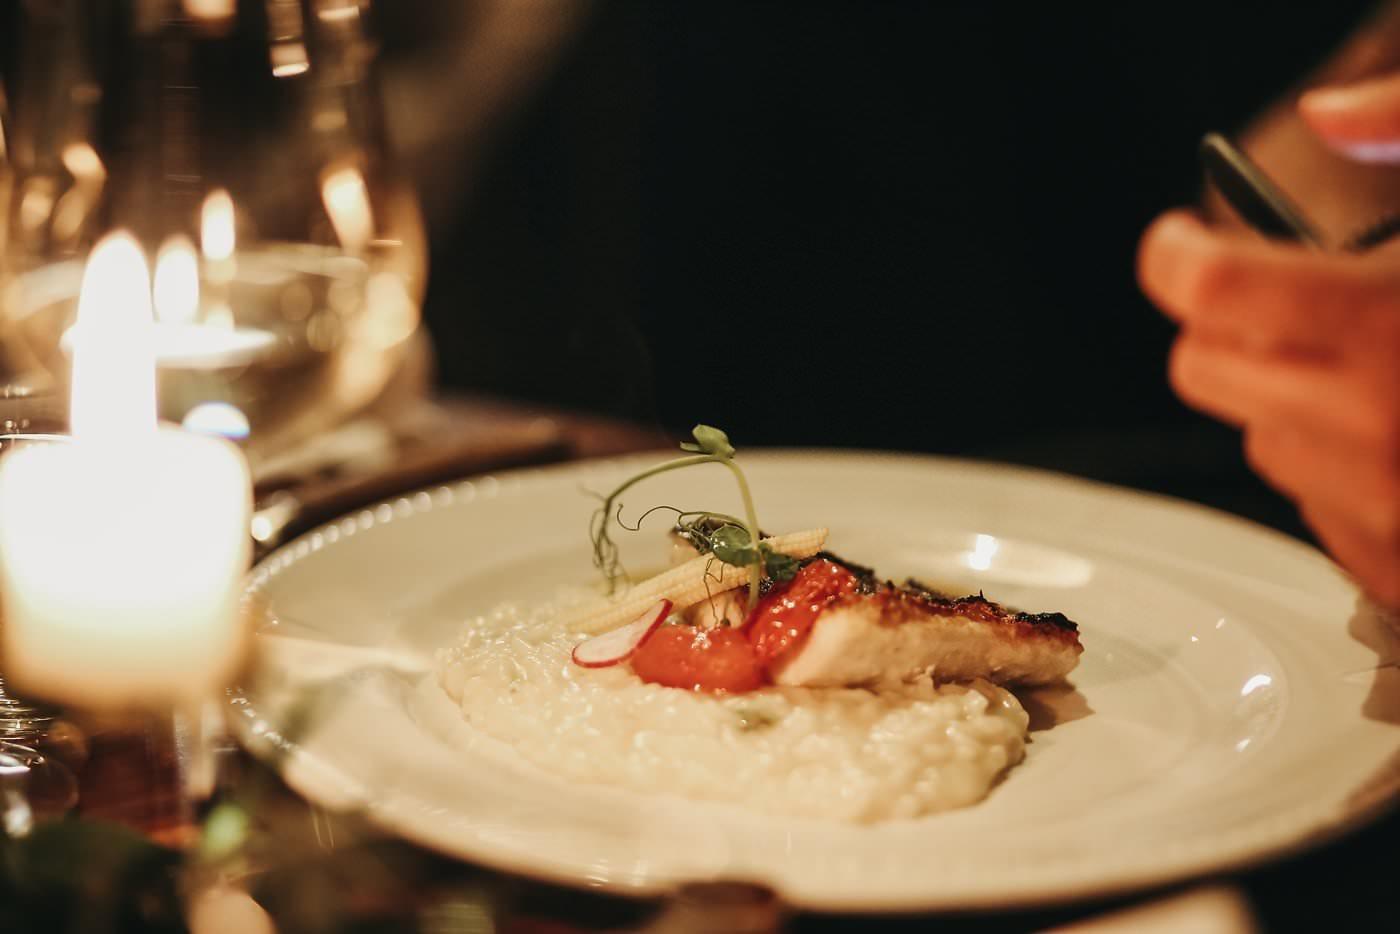 fotografo comida porto uber eats takeway lousada vizela guimaraes flow